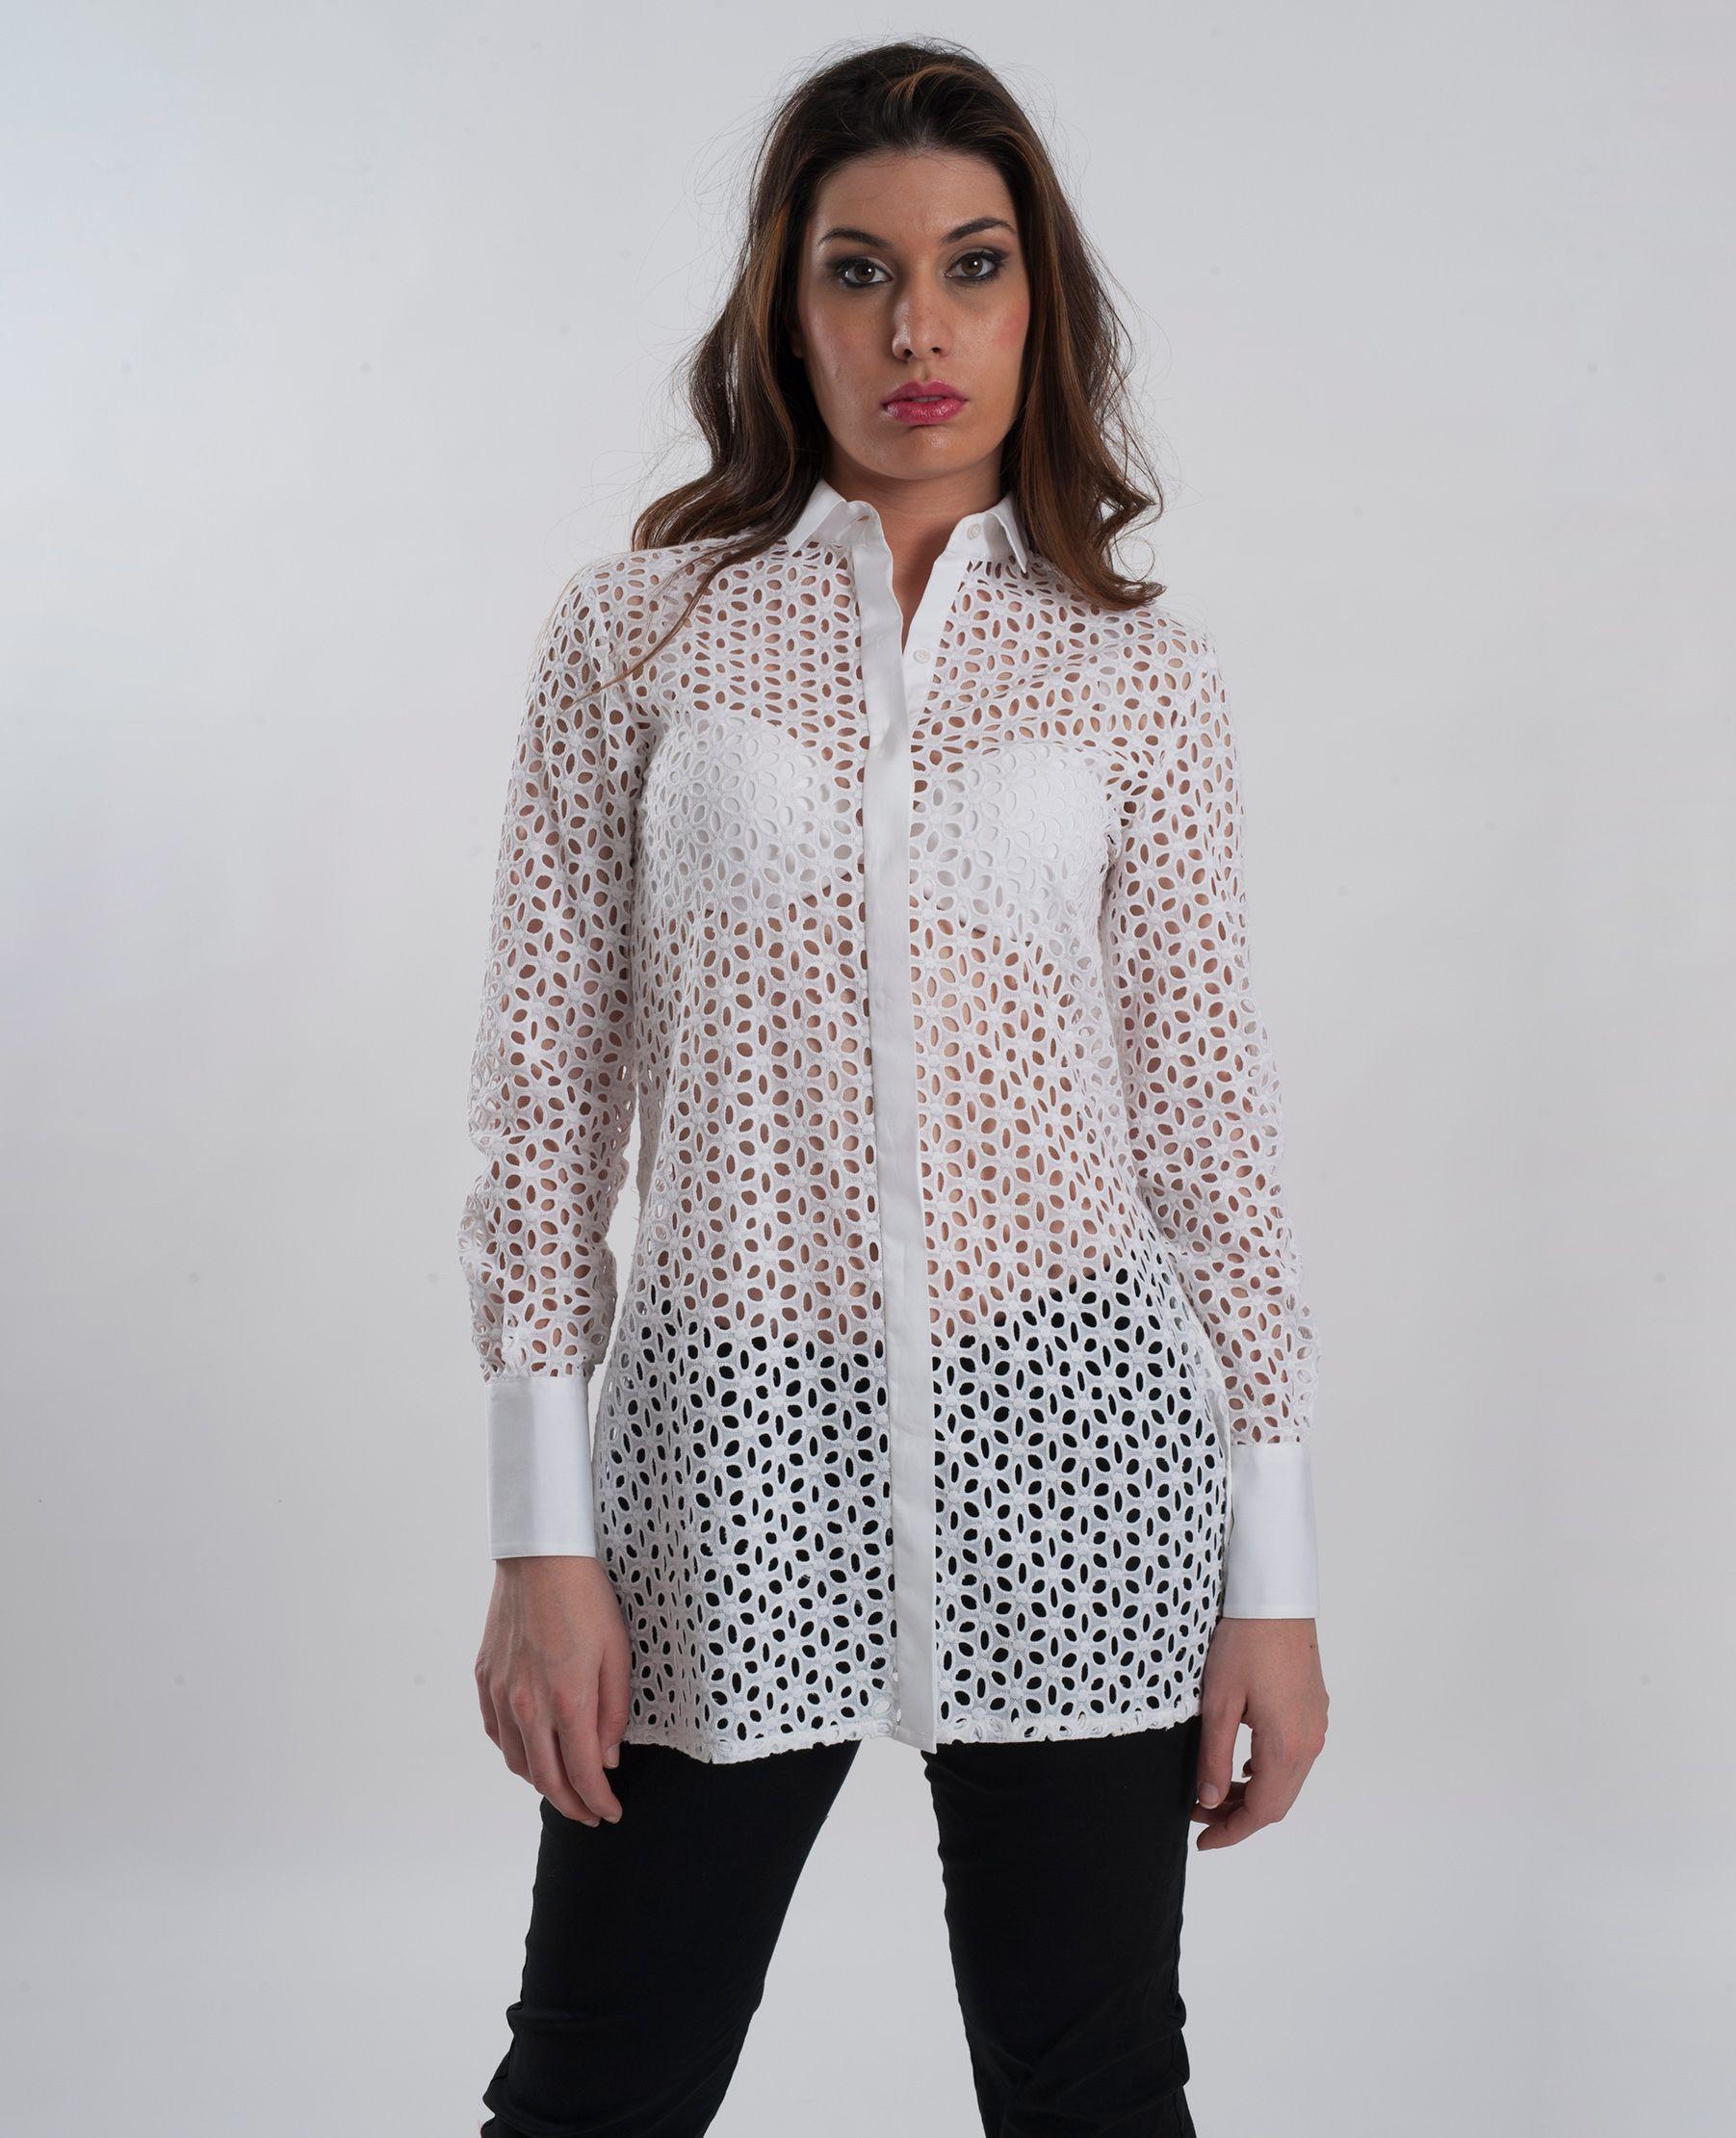 new product 63654 86915 Pin su Camicie Donna